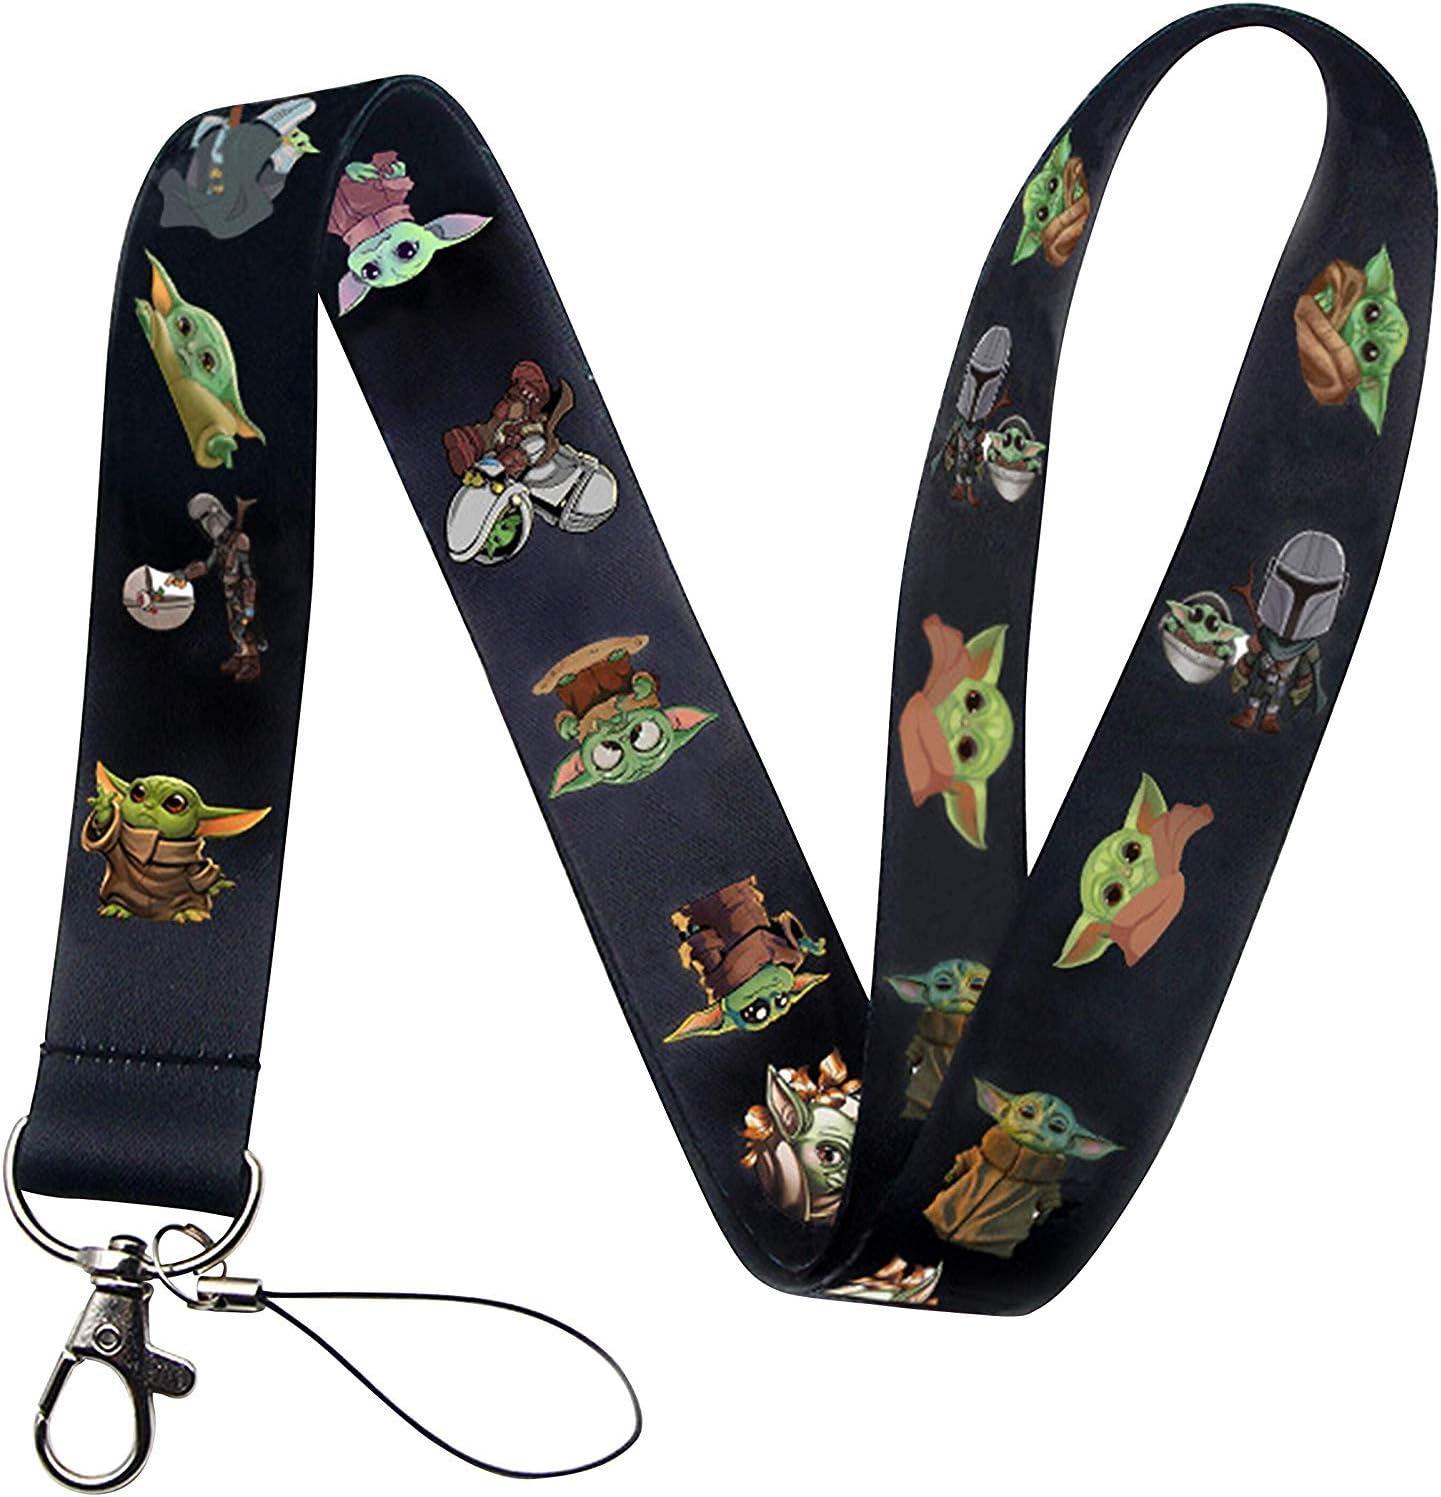 Cartoon Lanyard Cosplay Costume Adult Unisex Polyester Lanyard for Keys Phone Merchandise Accessories (Black)